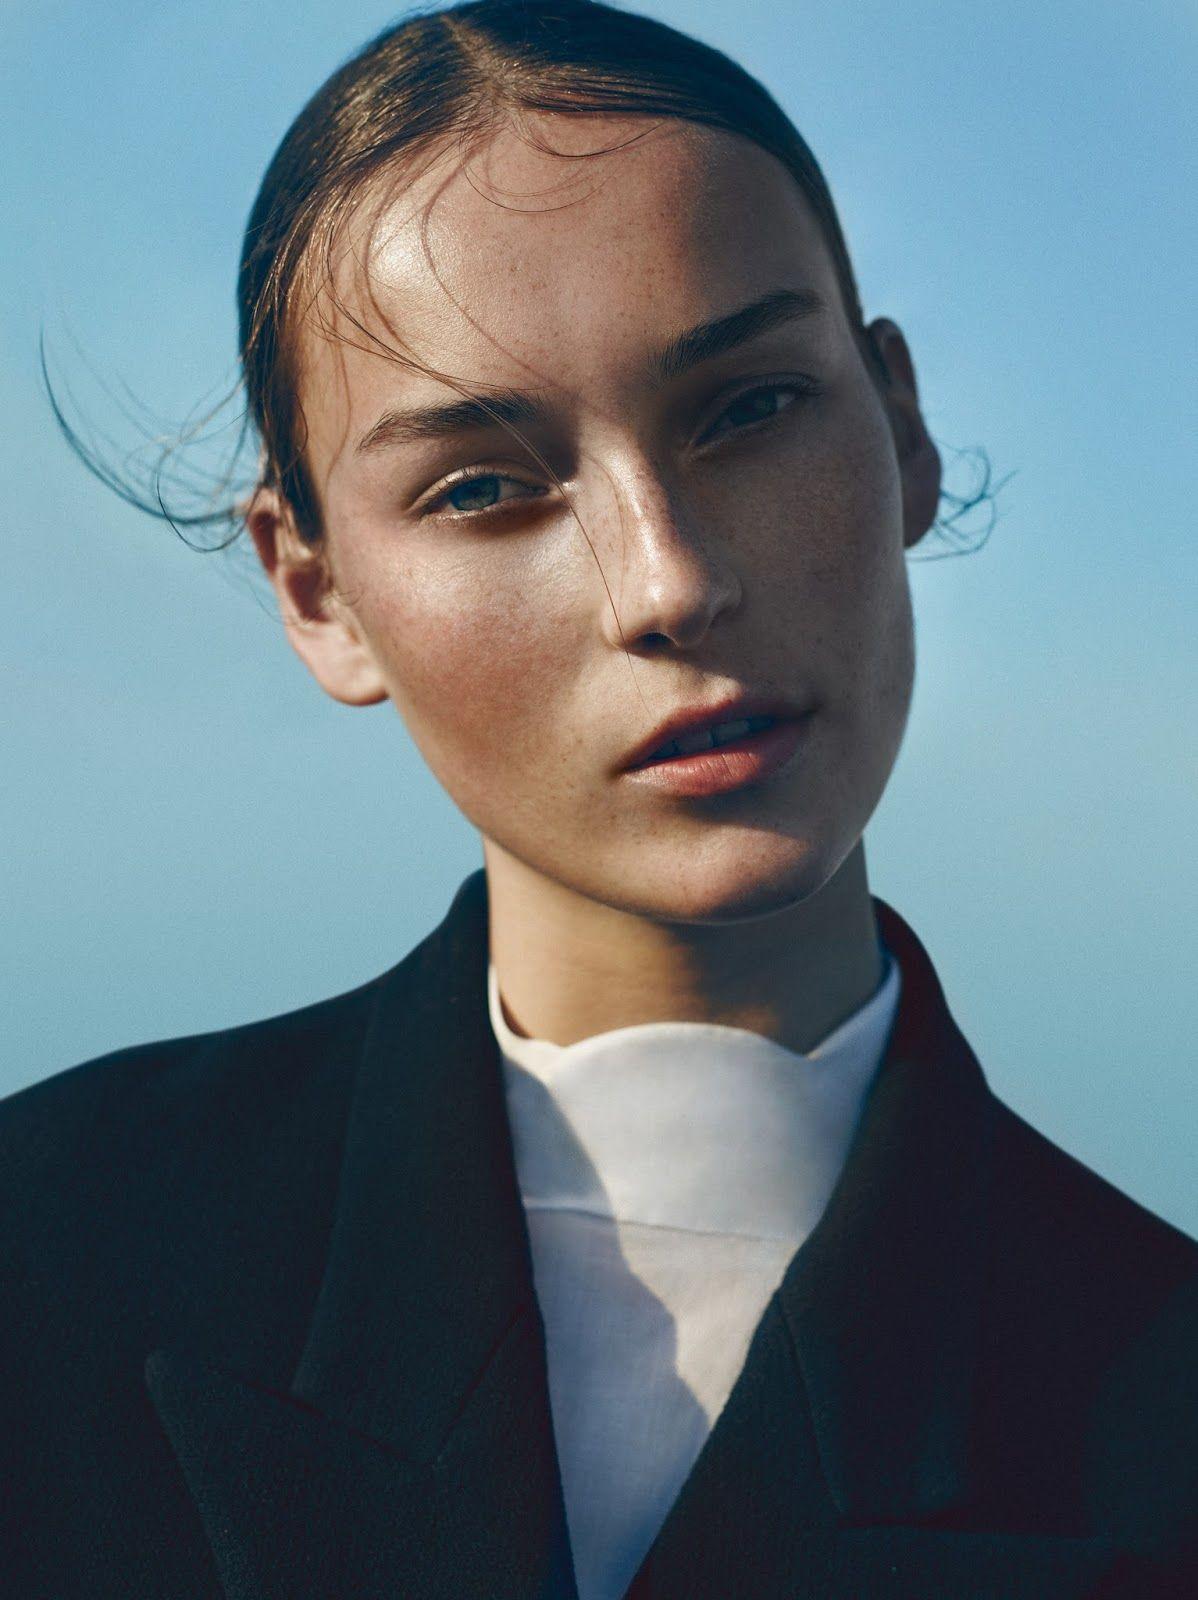 julia bergshoeff by annemarieke van drimmelen for vogue netherlands june 2016 | visual optimism; fashion editorials, shows, campaigns & more!